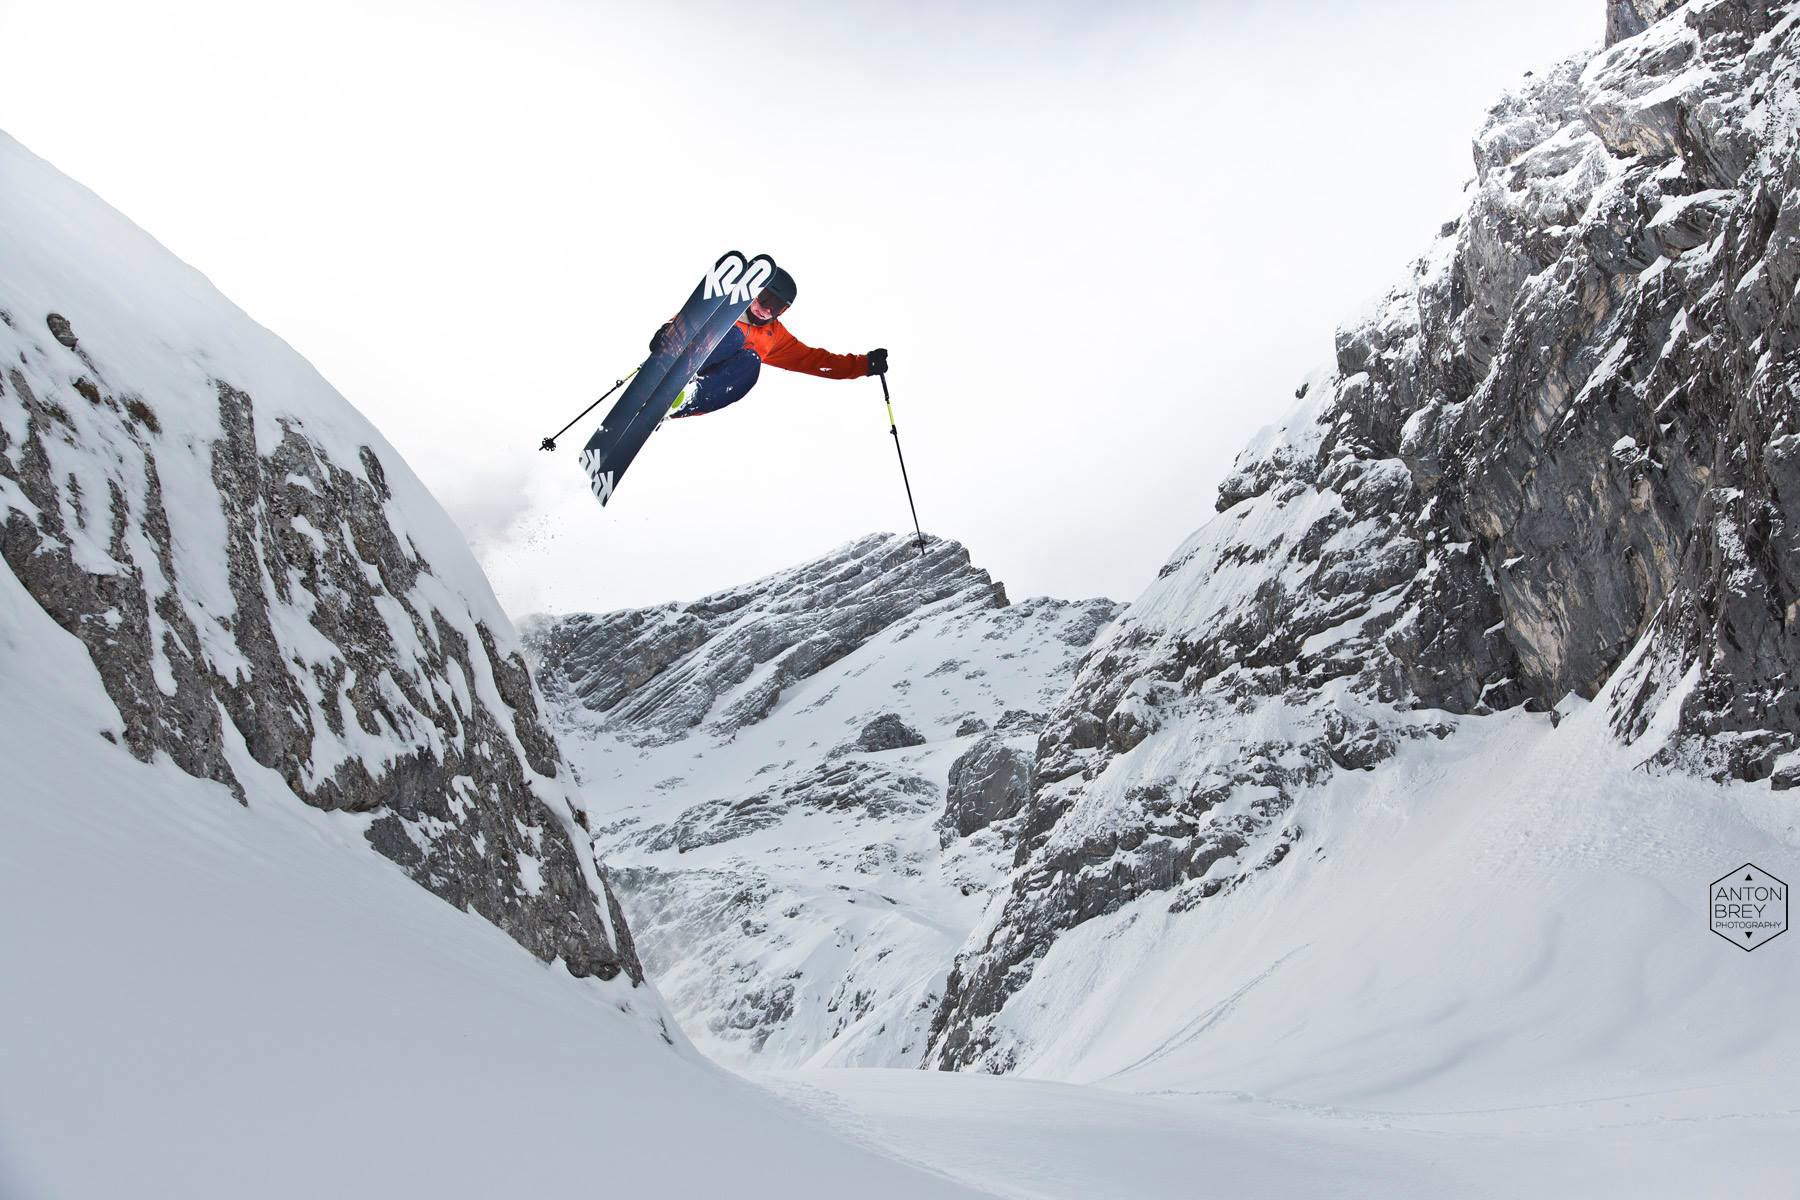 Lucas Mangold Season Edit 16/17 – Skiing with Friends